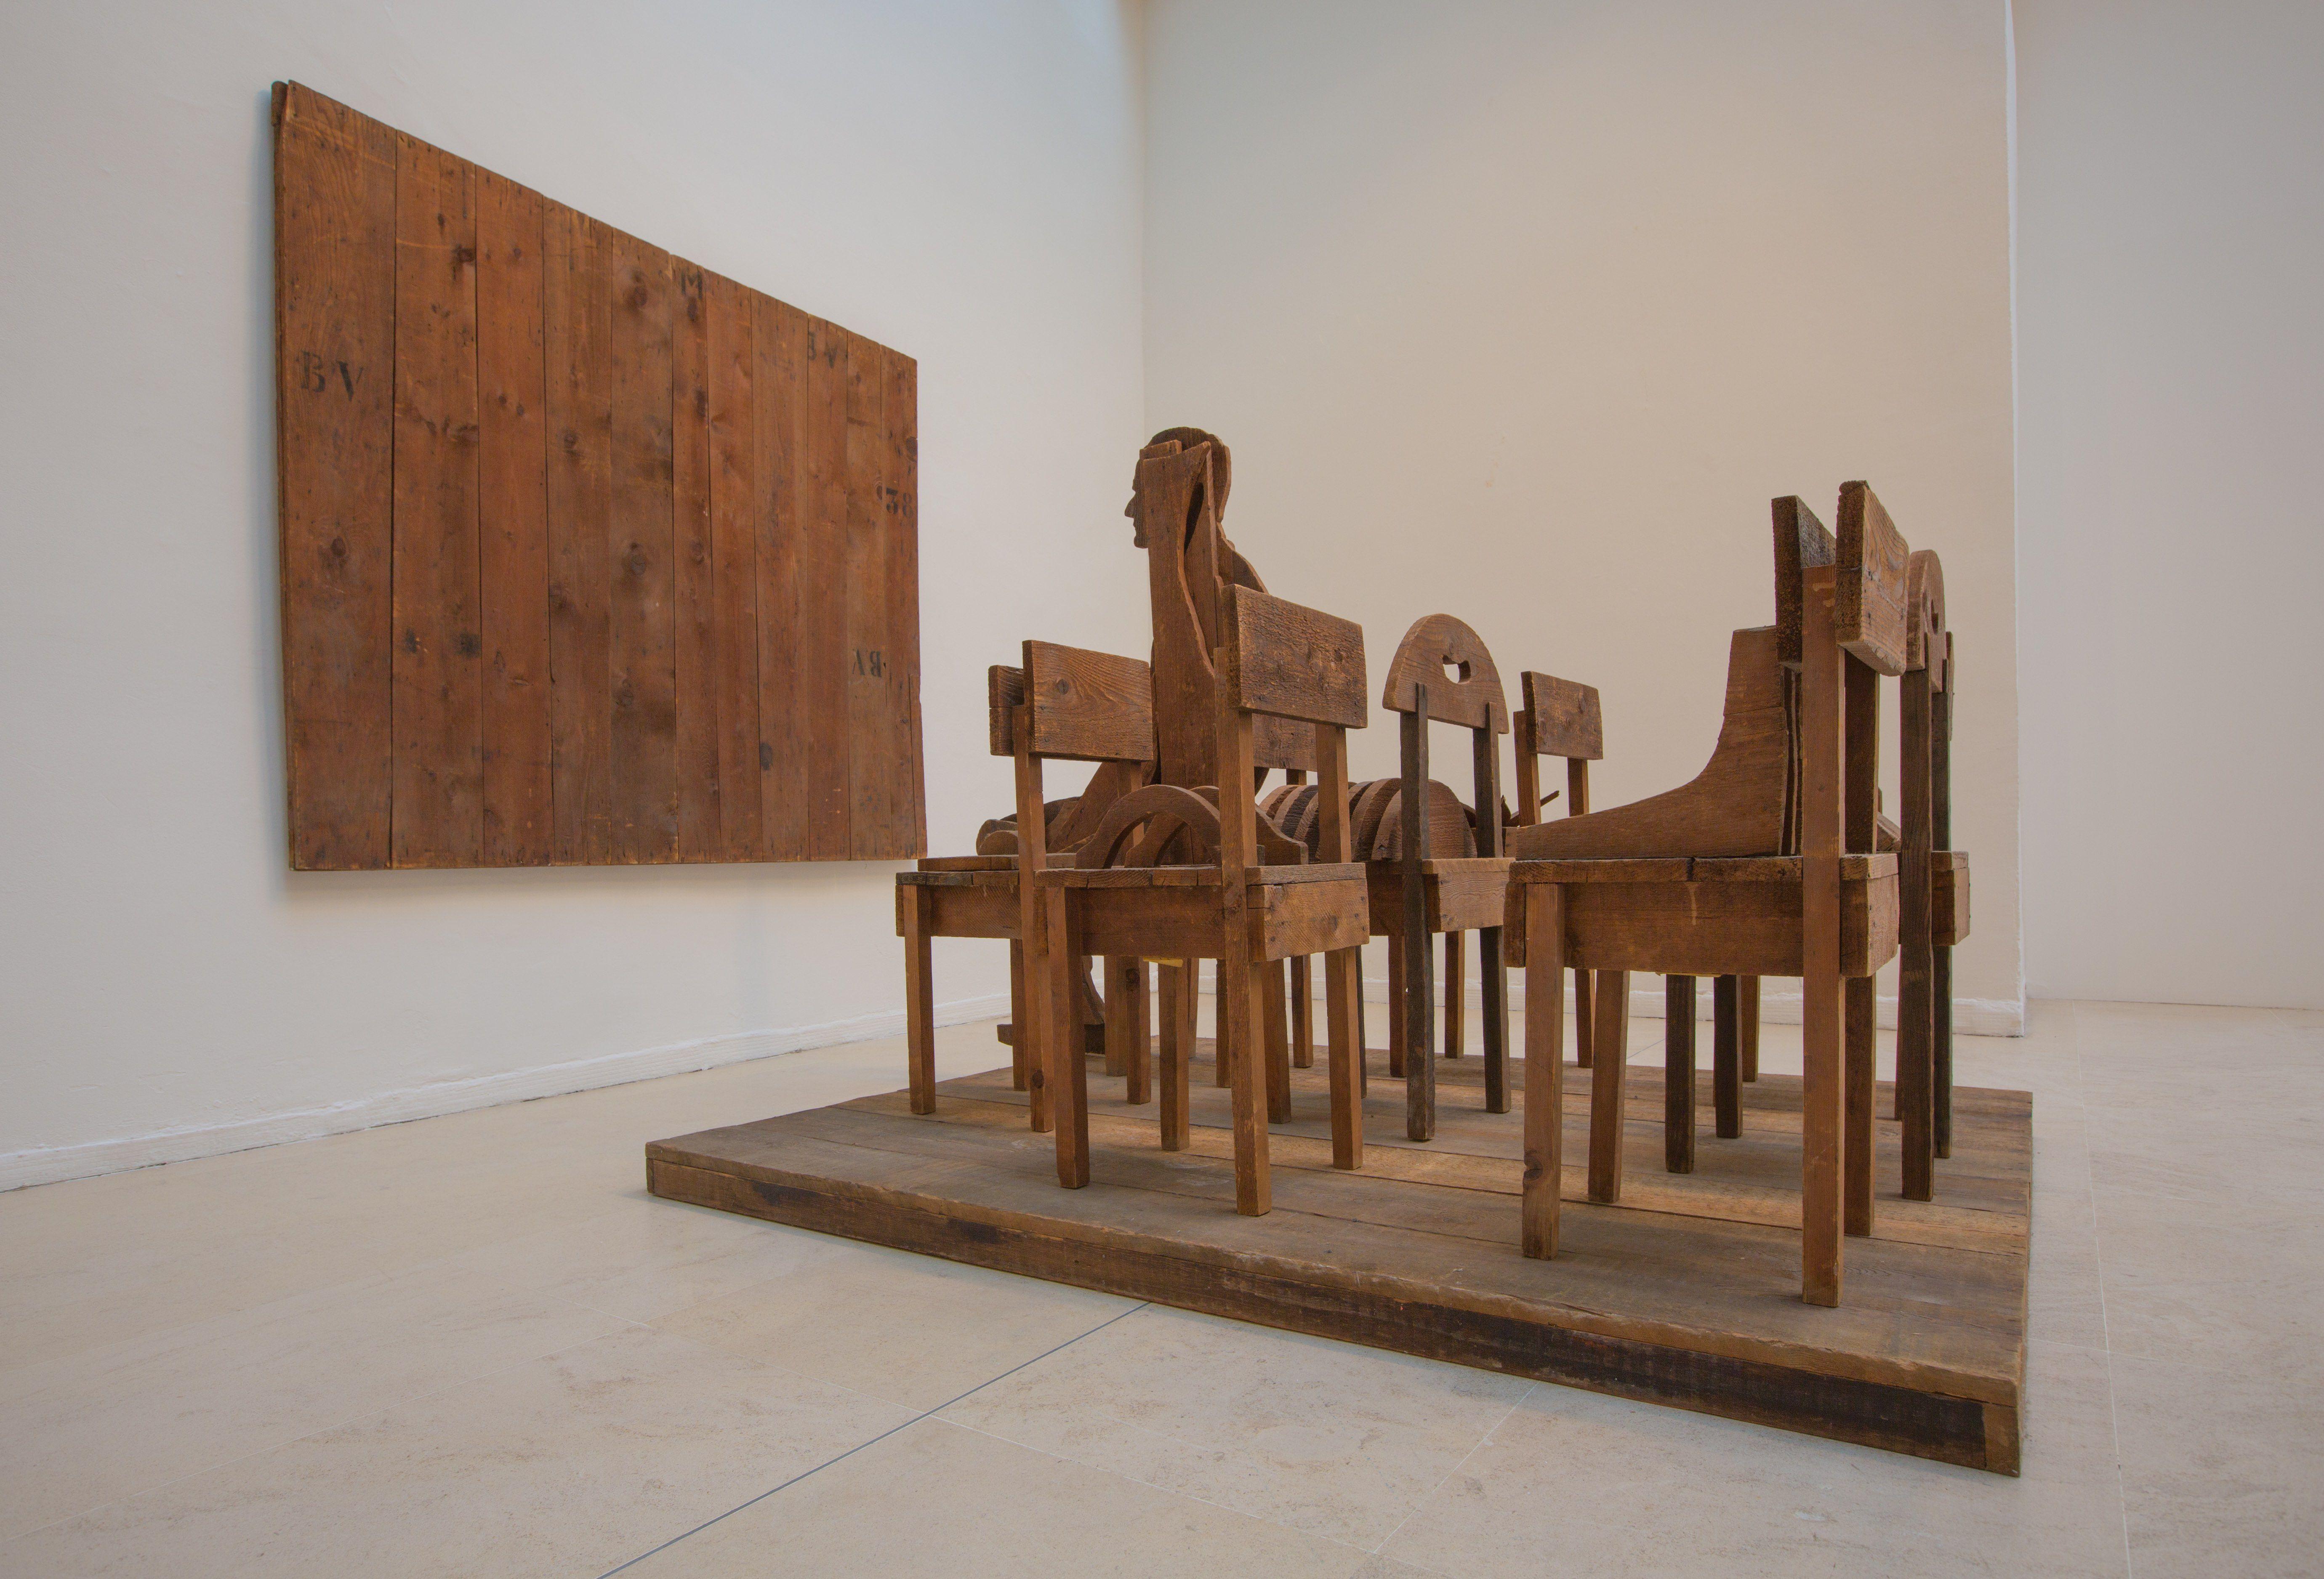 Mario Ceroli, Burri,1966 Tornabuoni Art - La Dolce Vita Courtesy Tornabuoni Art